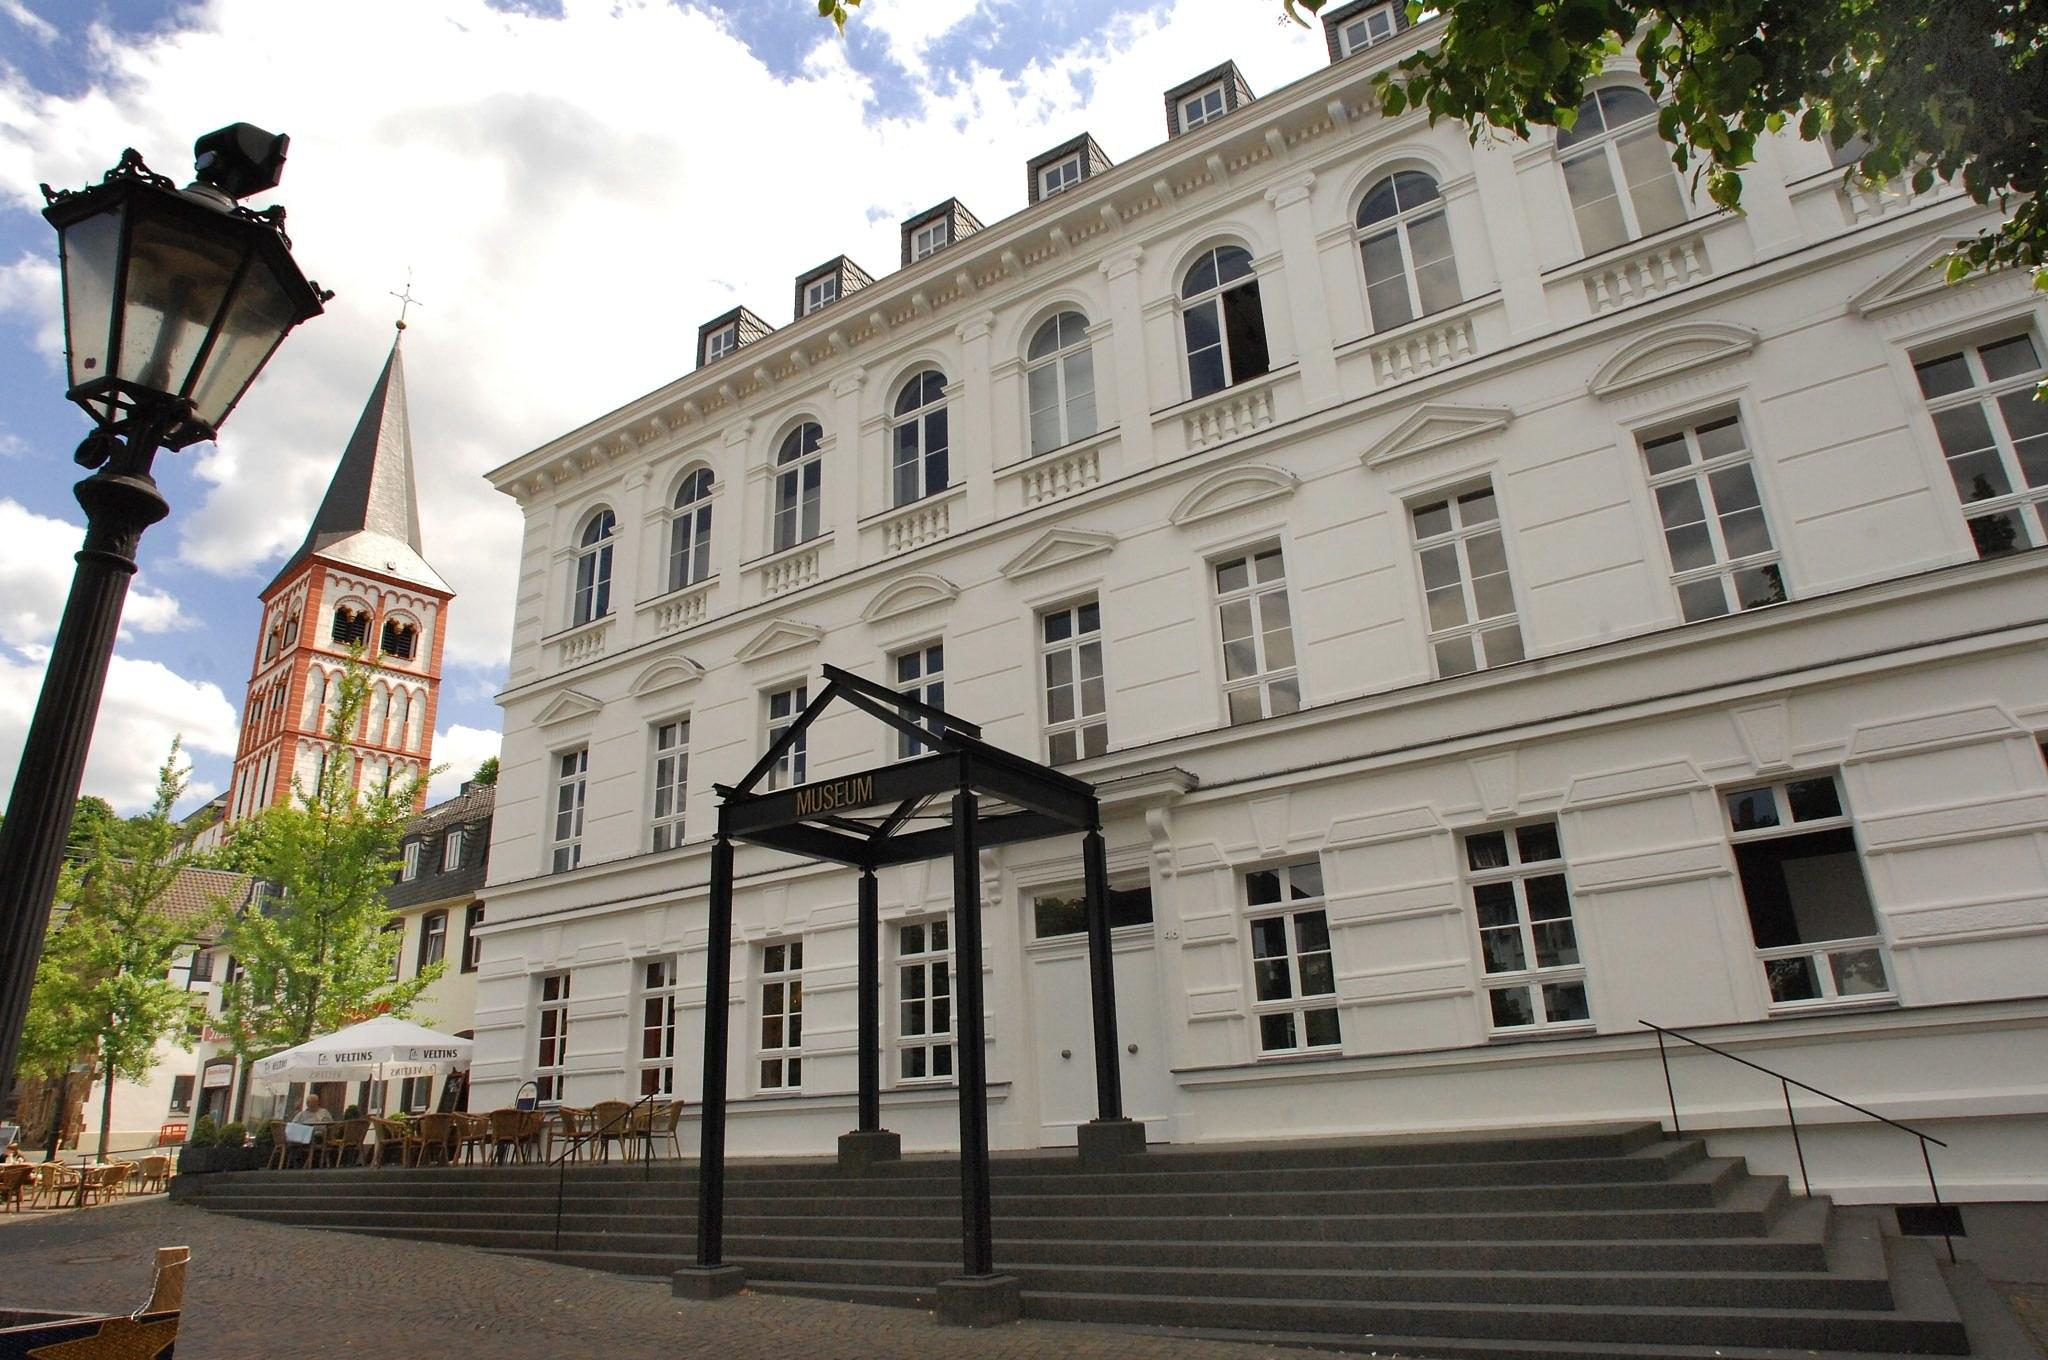 Reference city Siegburg - Quick pay via QR code